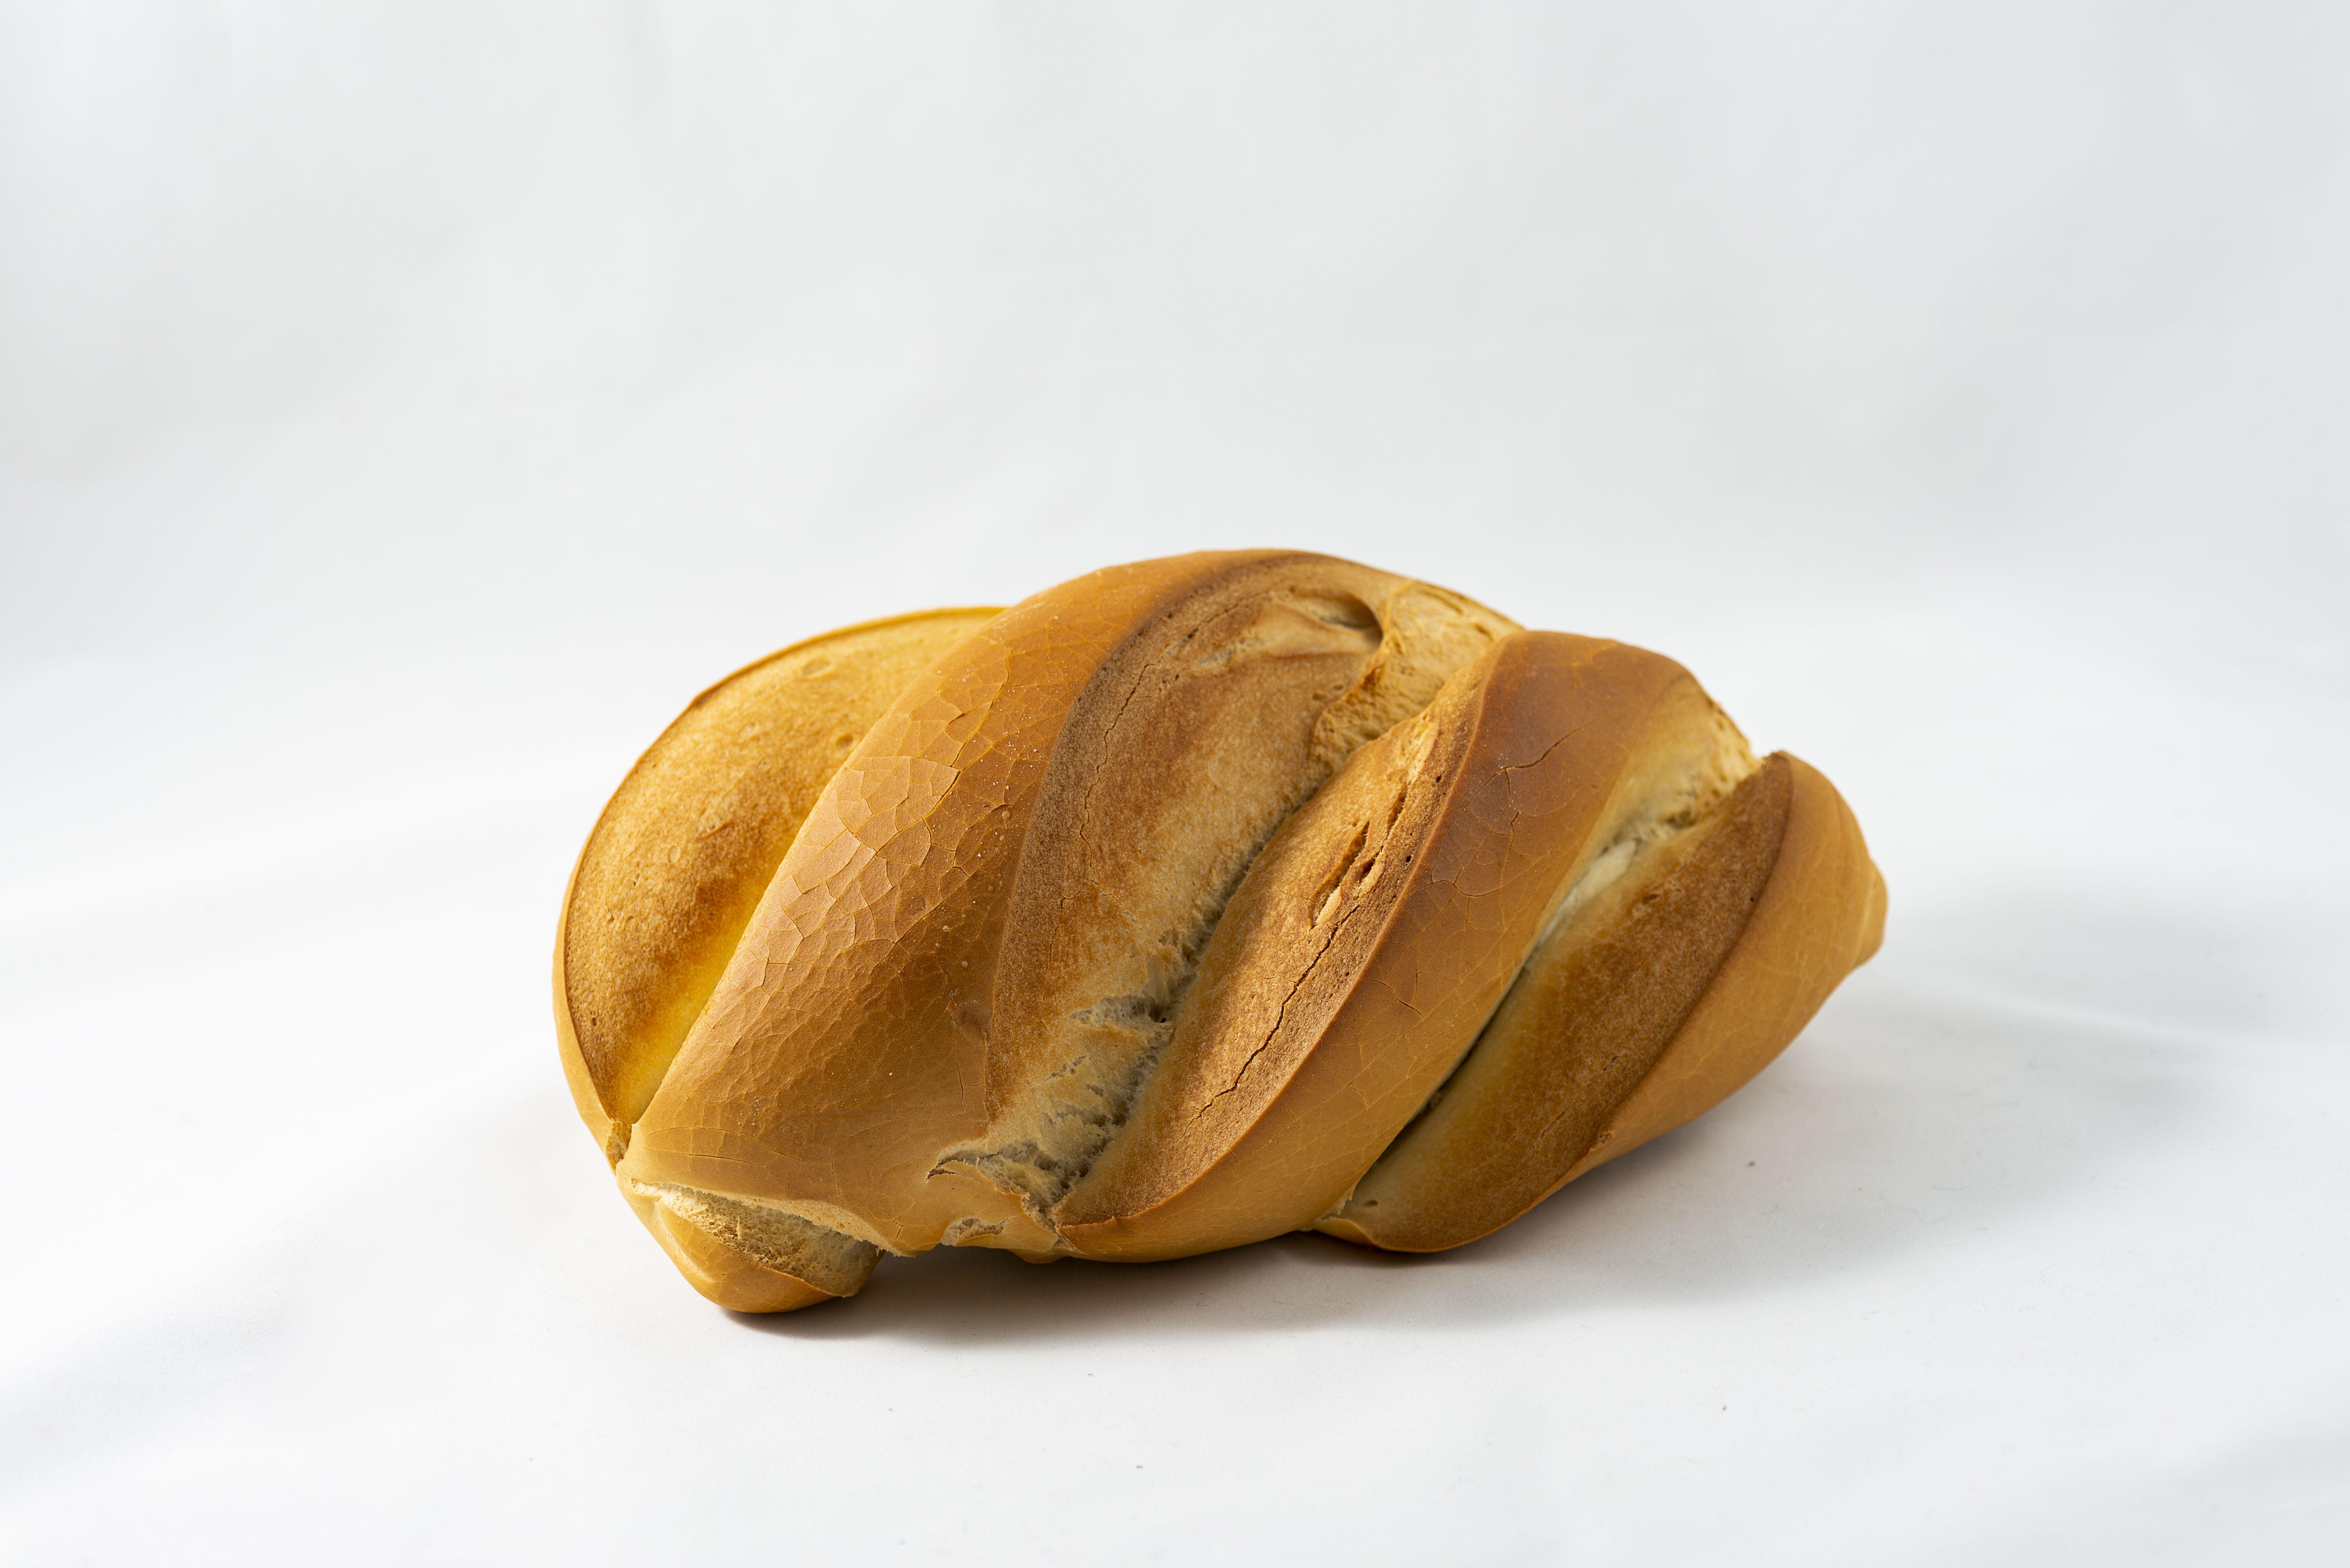 Diversos tipos de pan